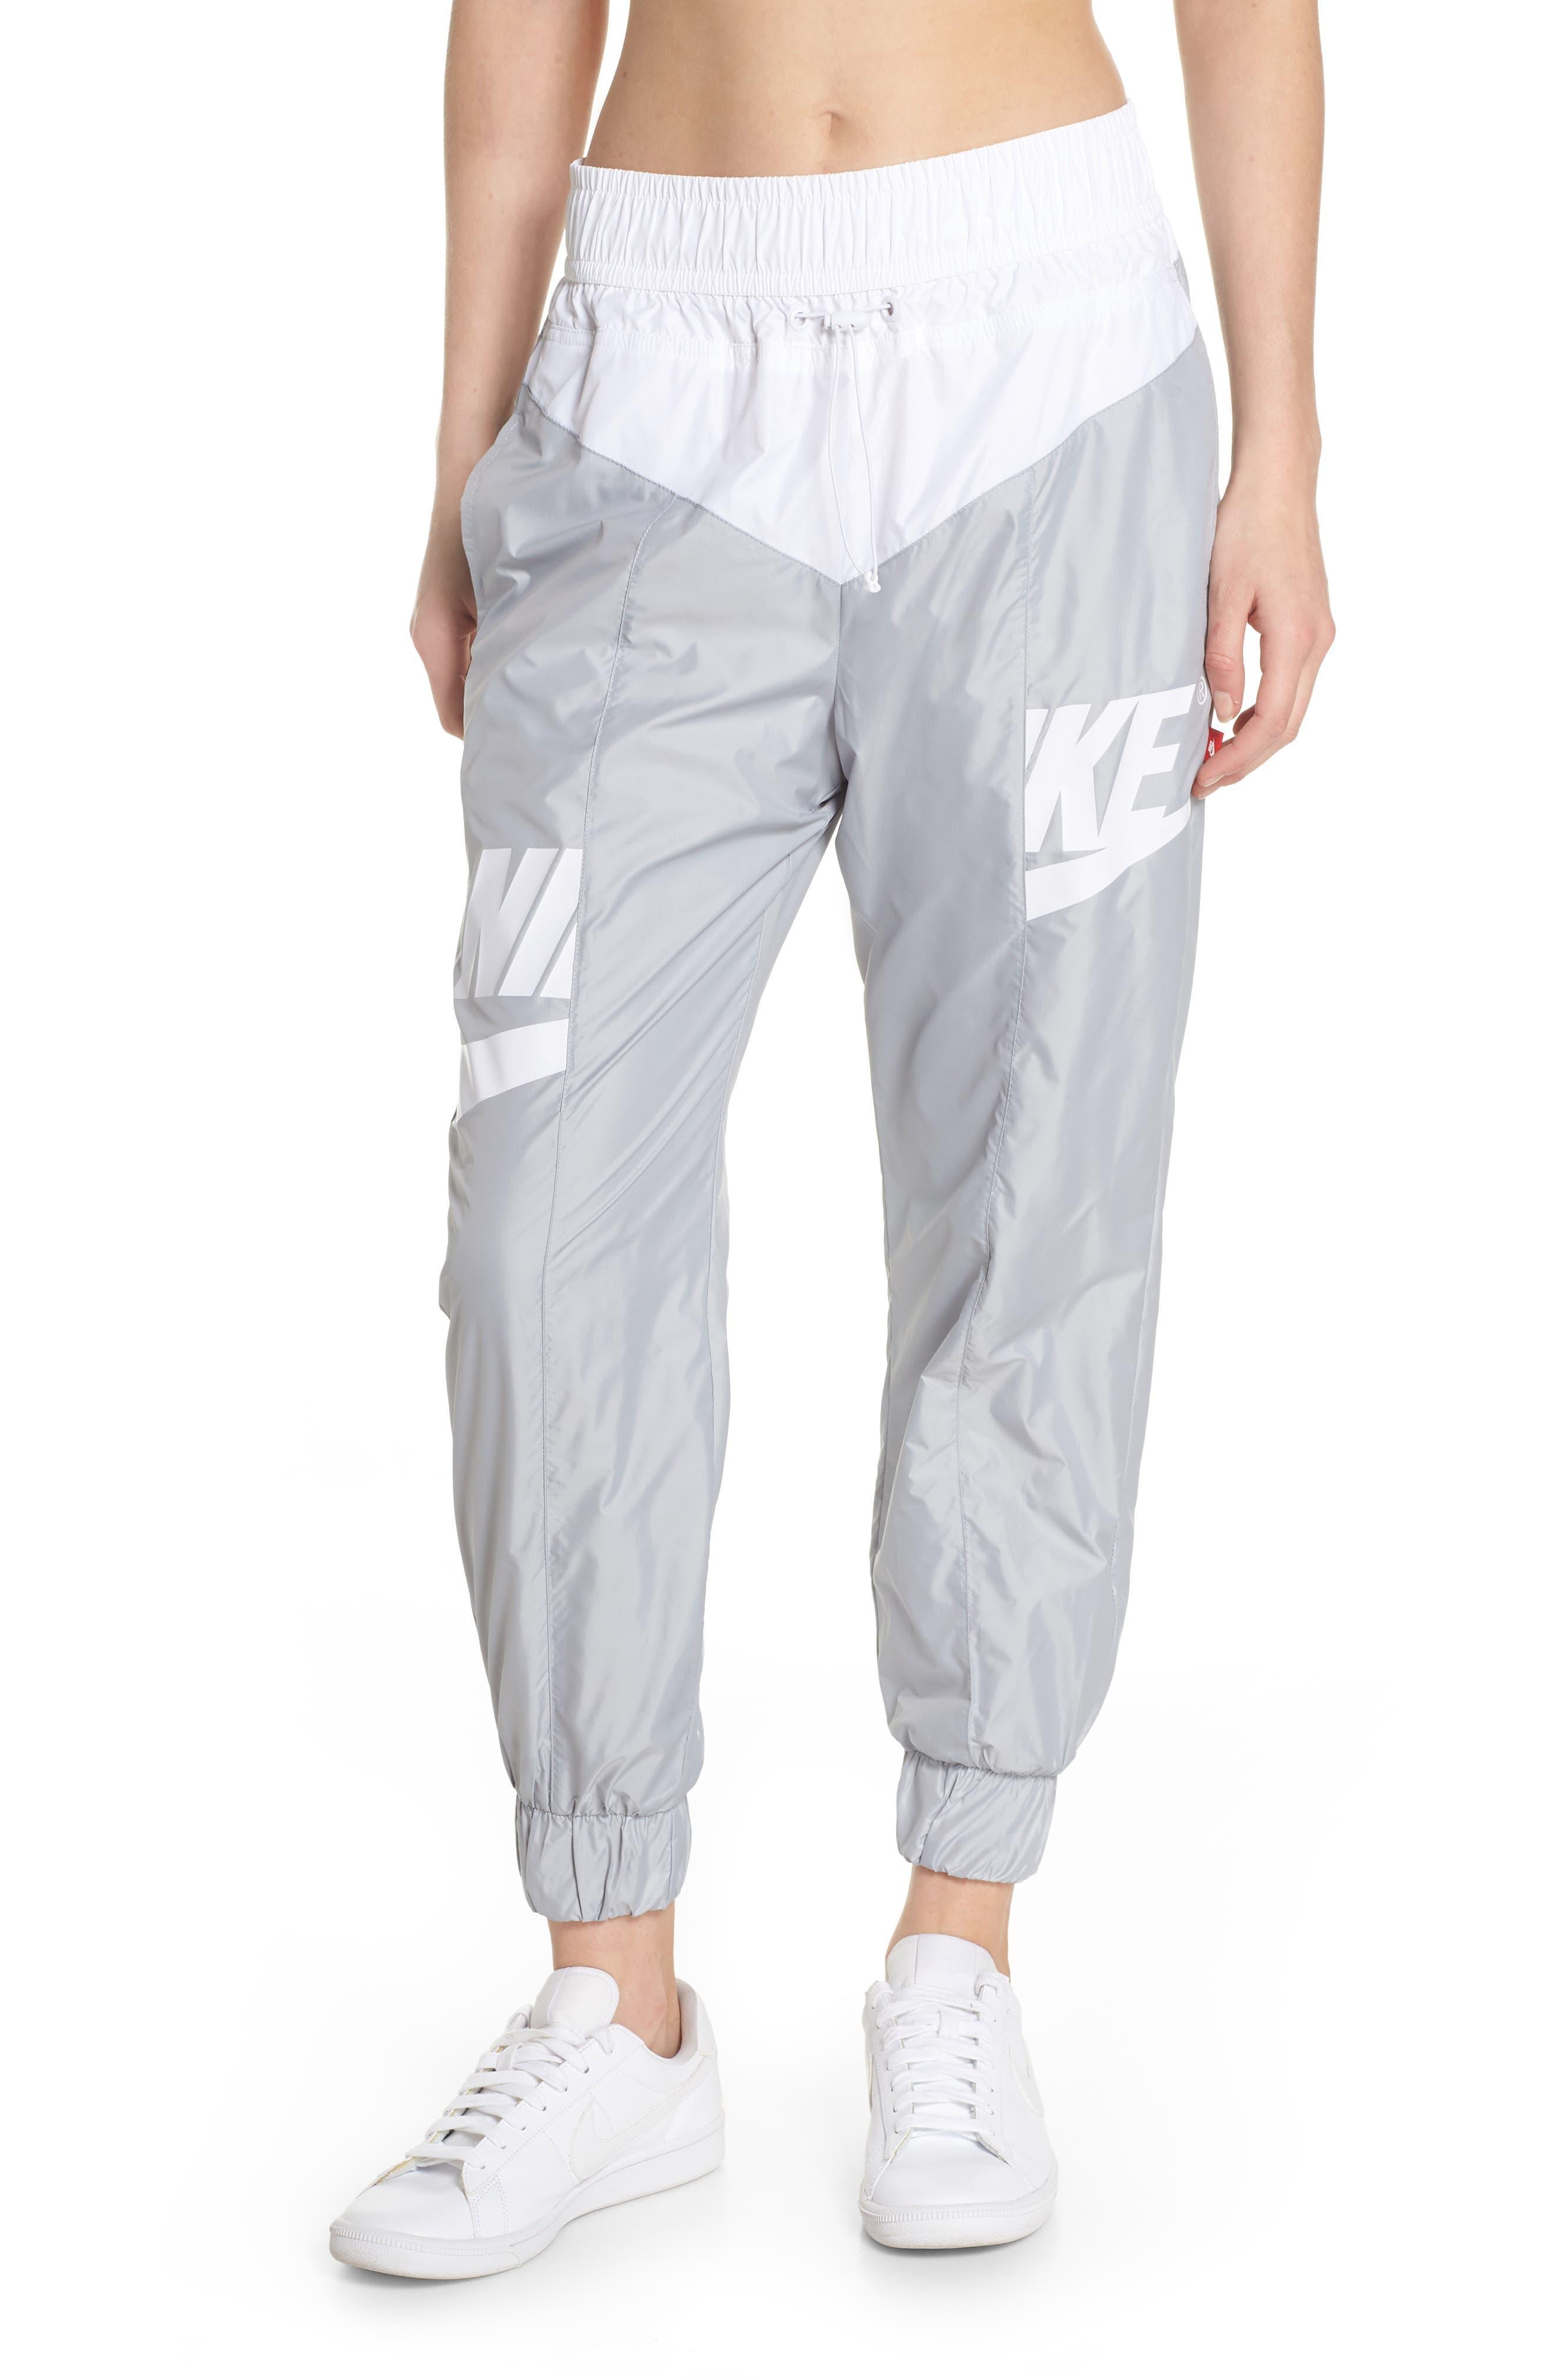 Sportswear Windrunner pants,                         Main,                         color, Wolf Grey/ Summit White